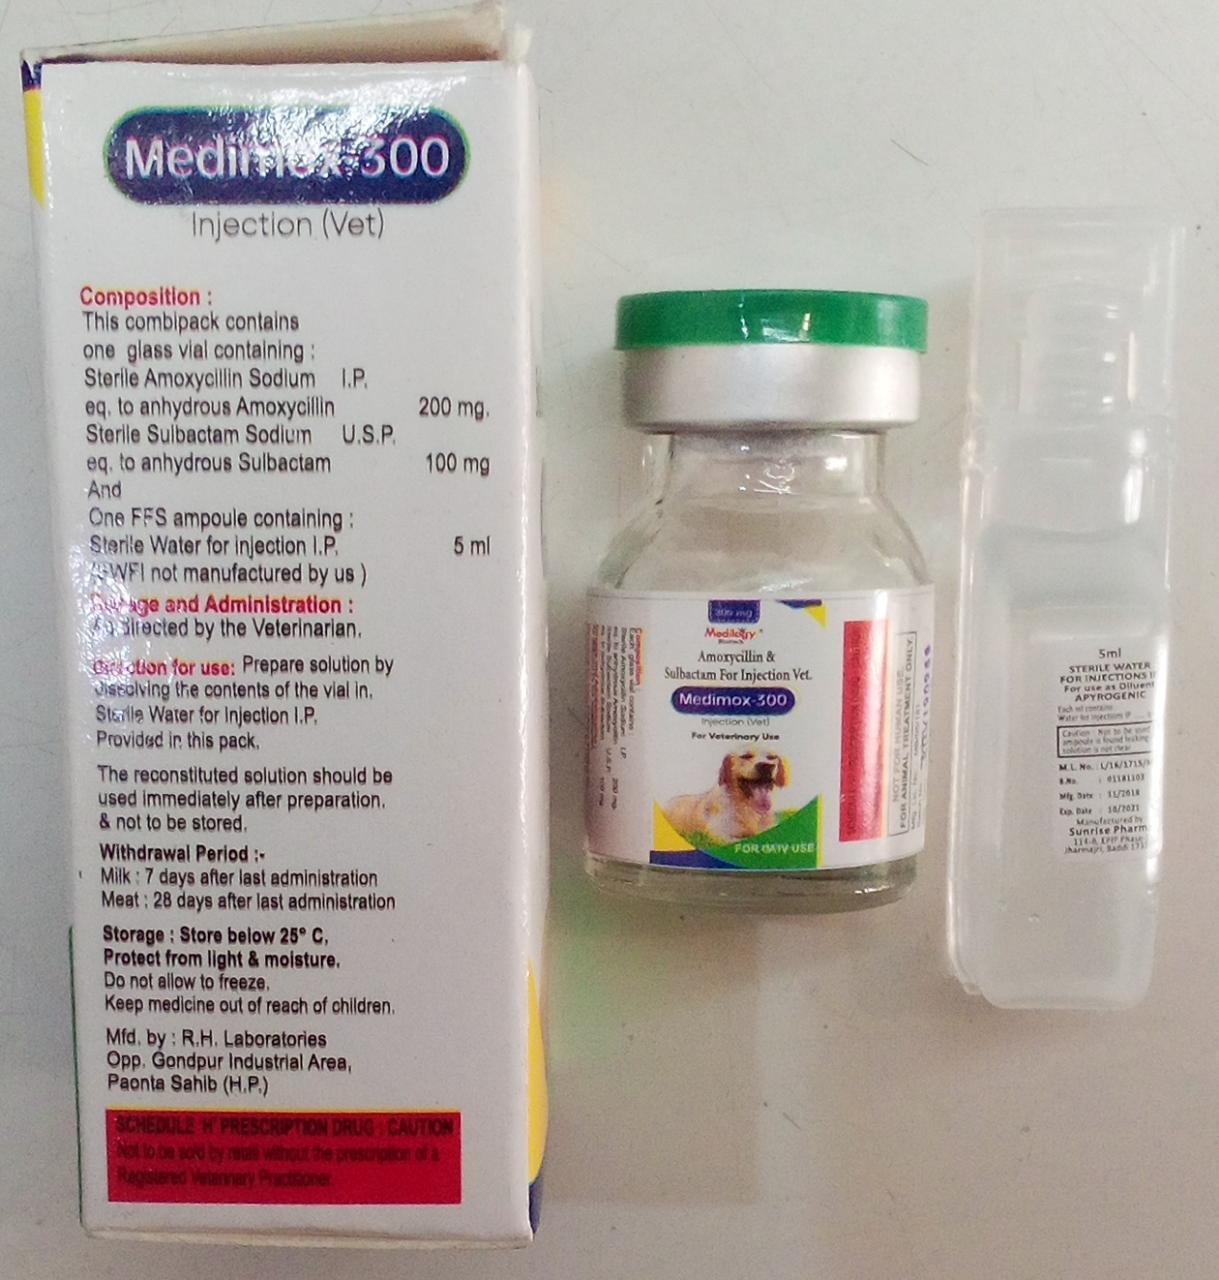 AMOXYCILLIN AND SULBACTAM FOR INJECTION VETERINARY